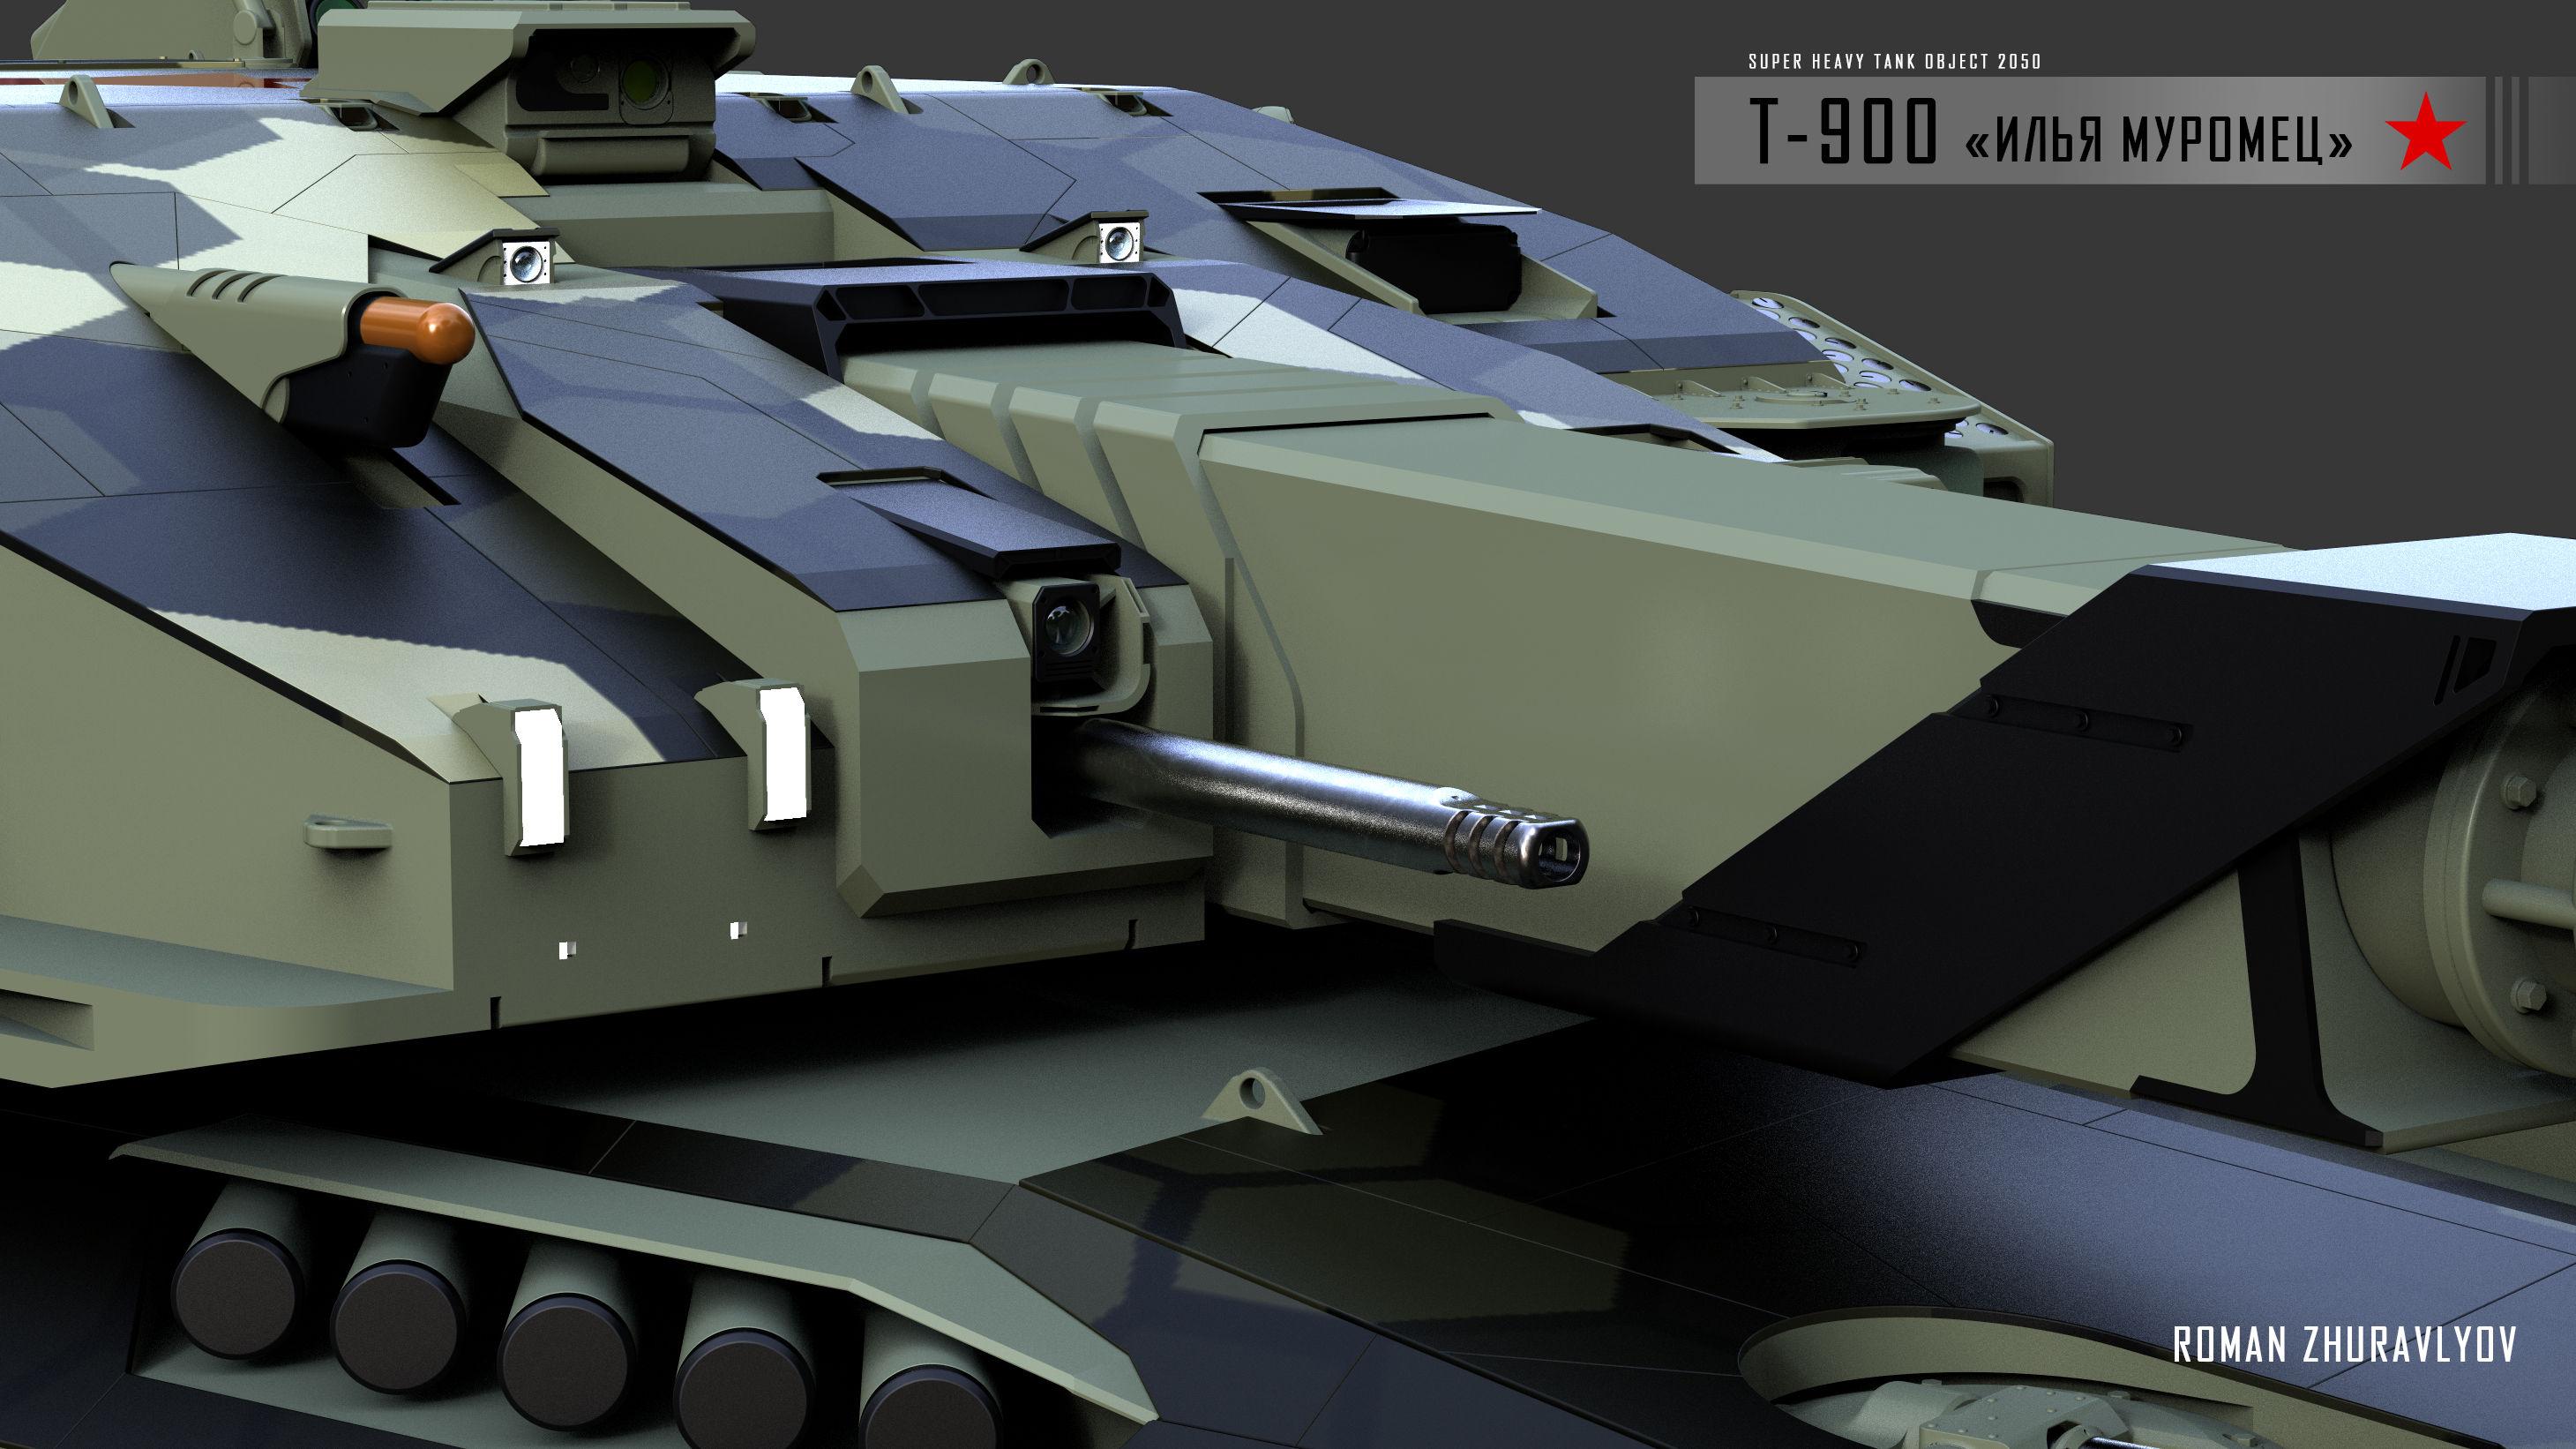 T-900-7-3500-3500